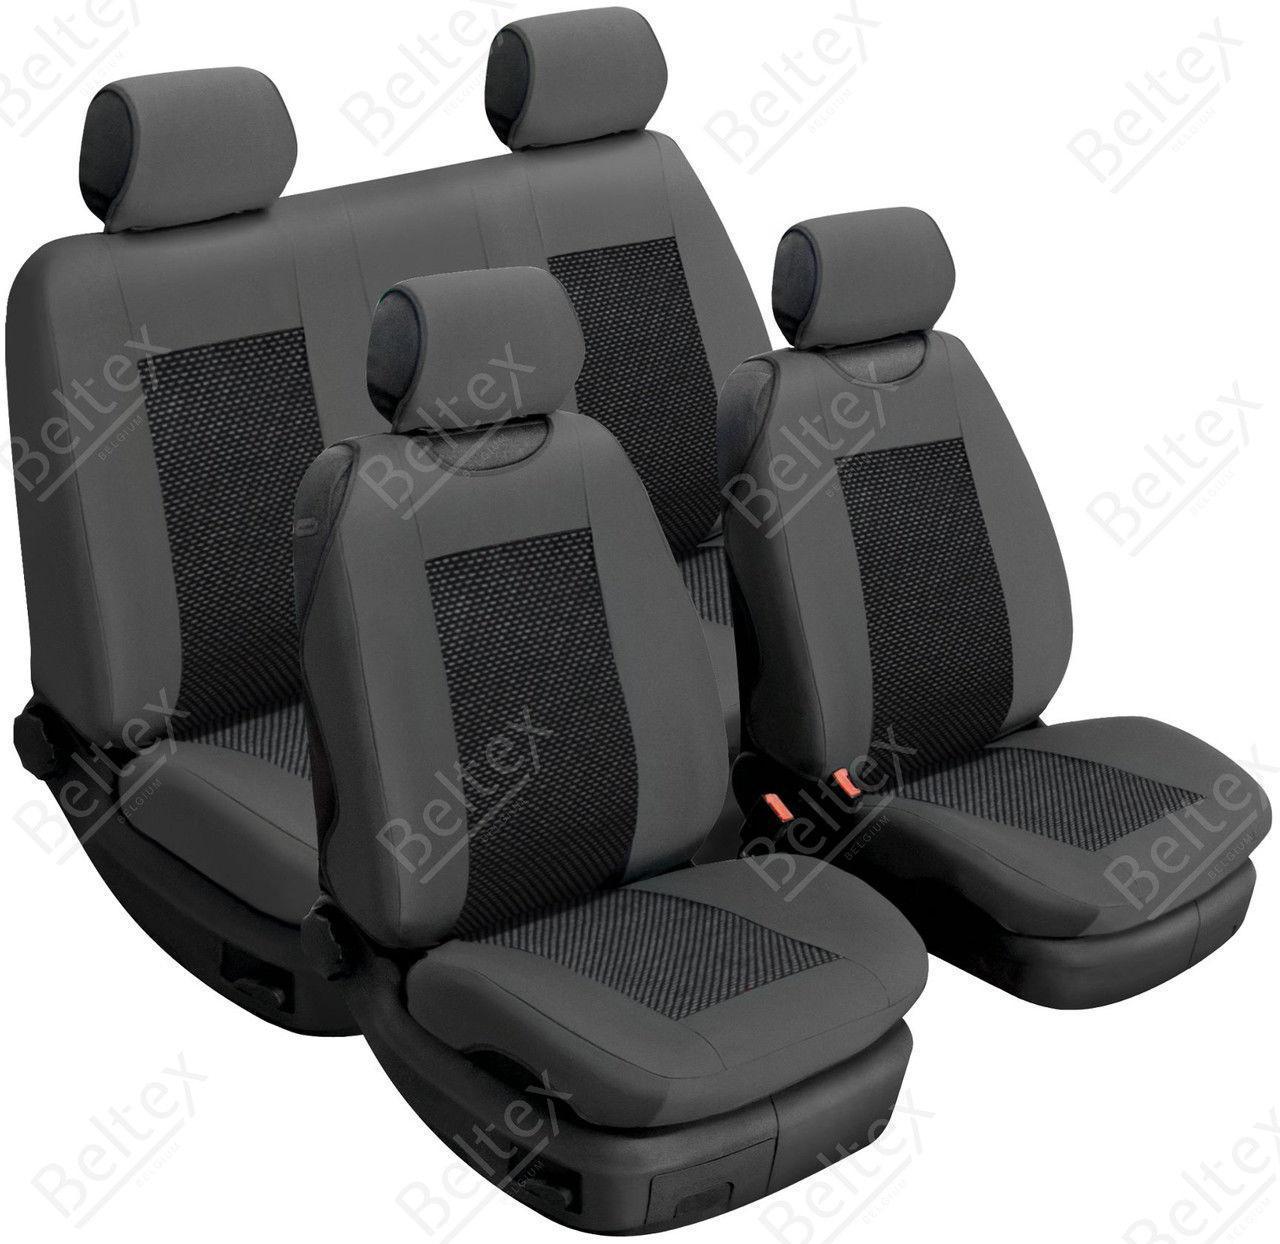 Майки/чехлы на сиденья Ниссан Мурано (Nissan Murano)